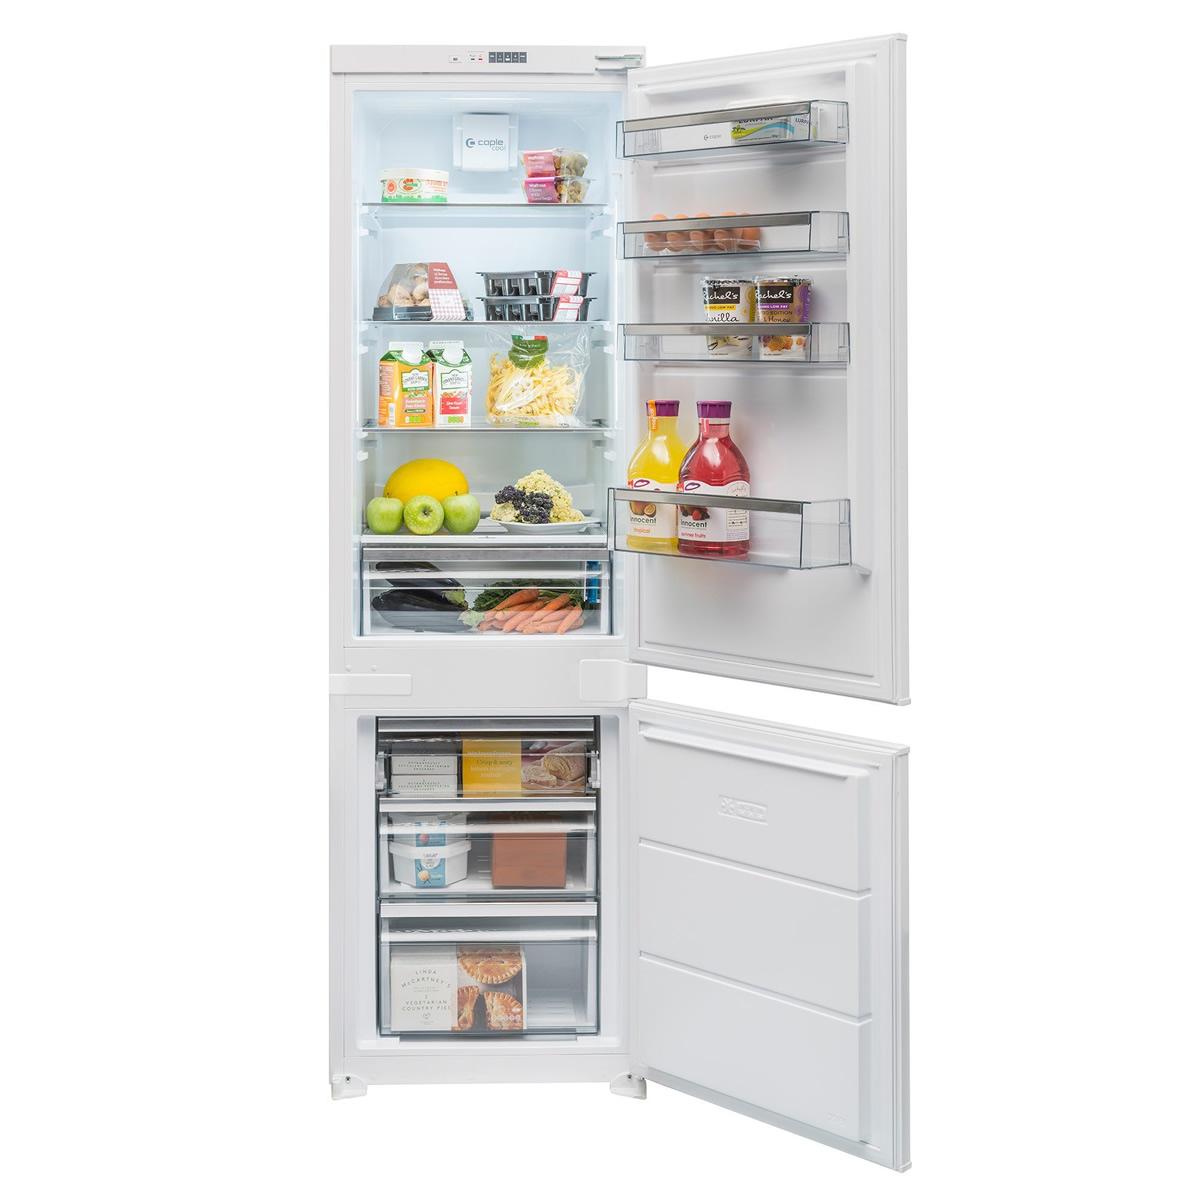 RI7305 256litre Integrated Fridge Freezer Frost Free Class A++